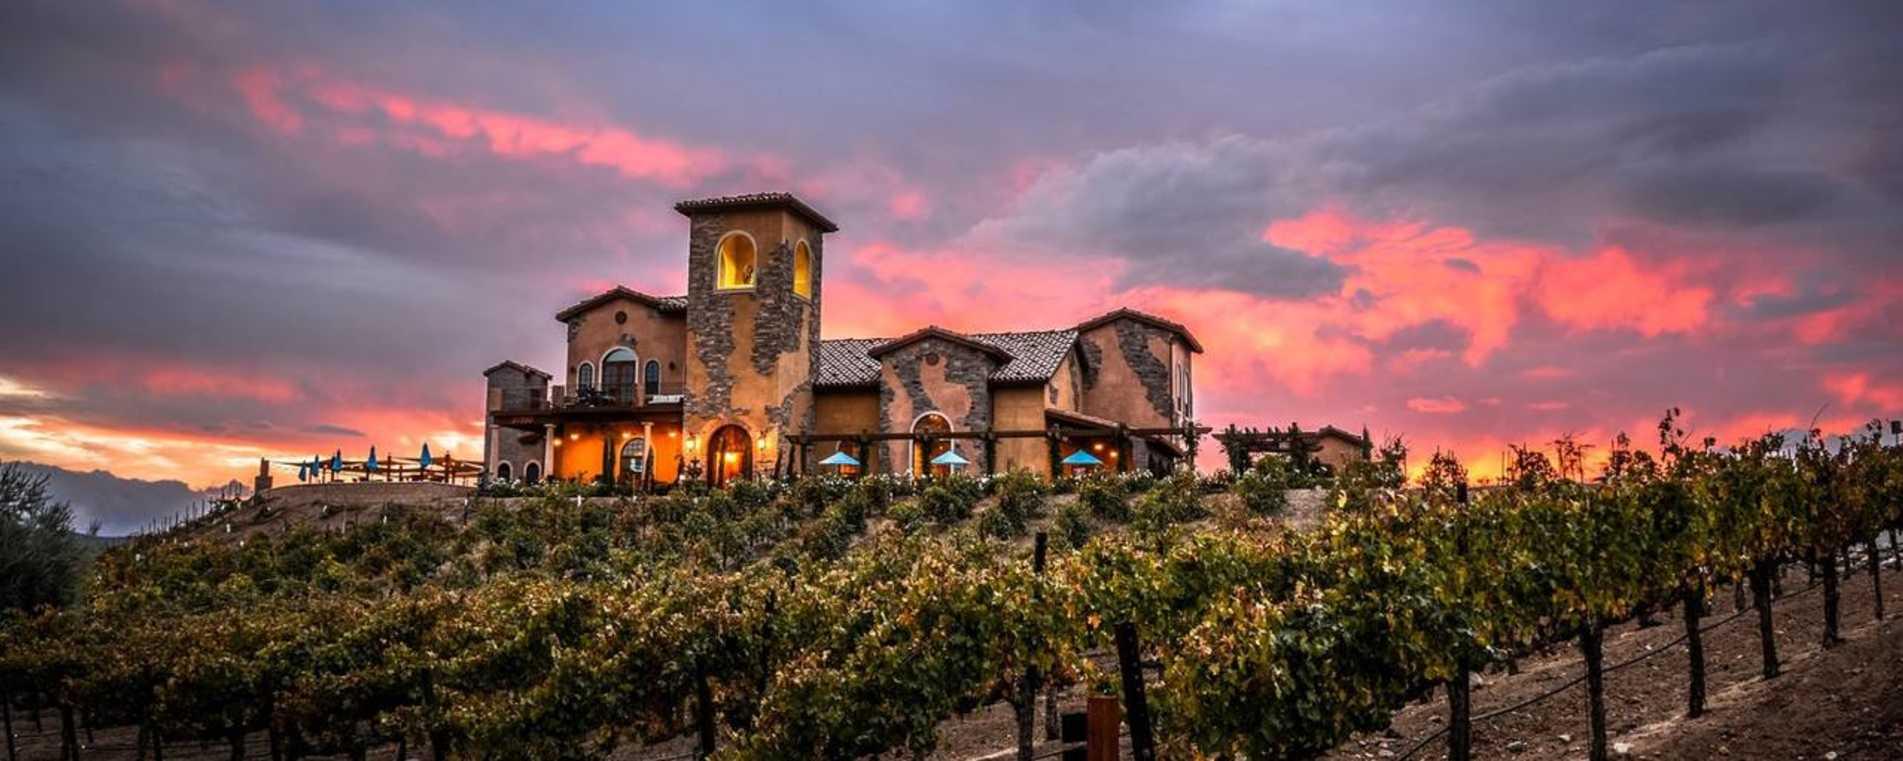 Robert Renzoni Vineyards & Winery - Temecula